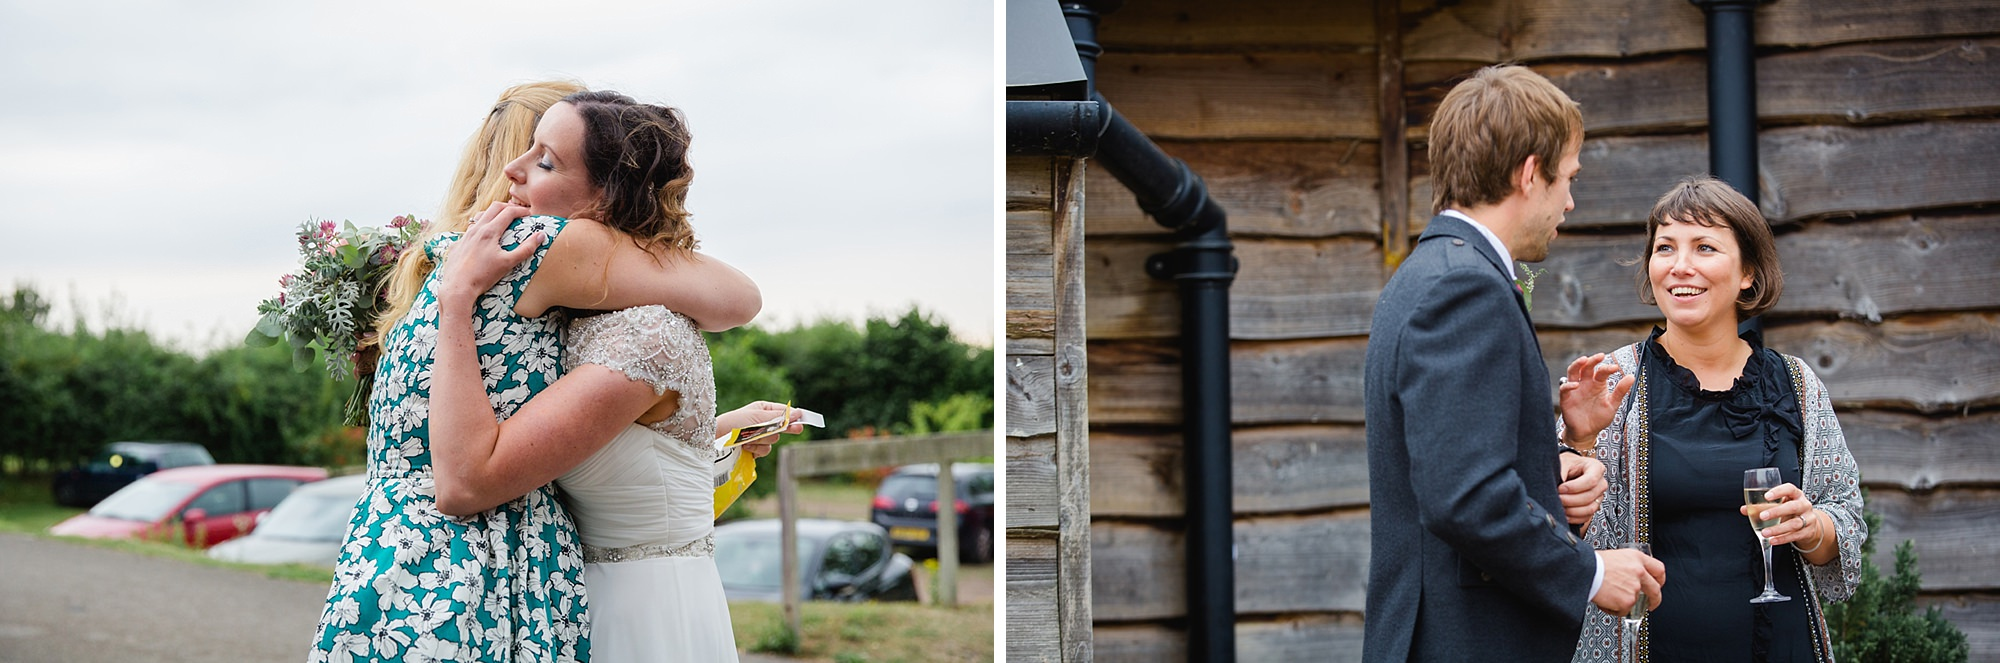 outdoor humanist wedding photography wedding guests hugging